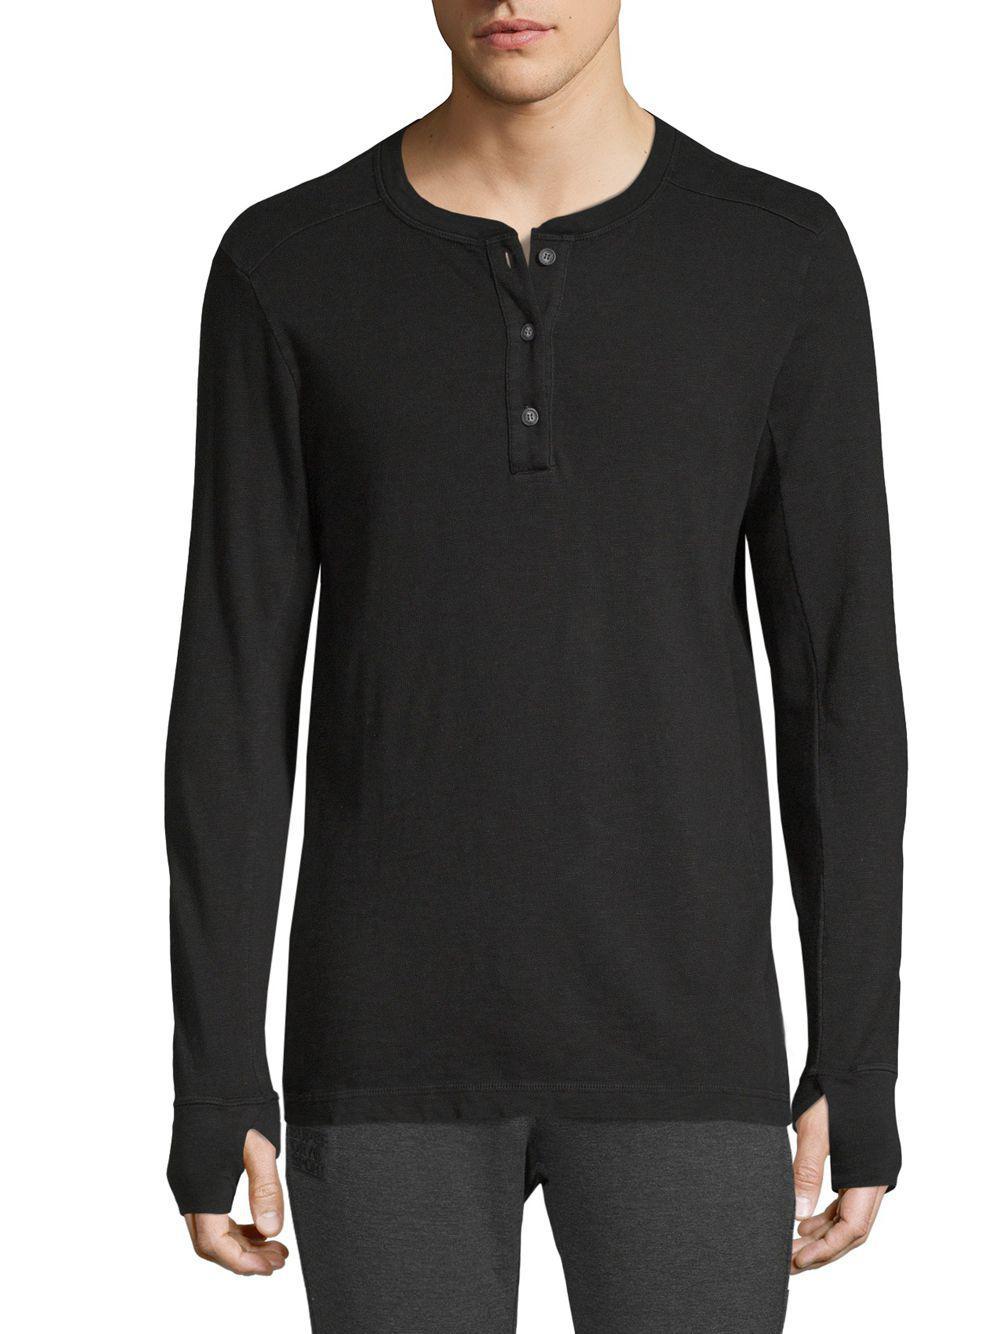 628b567f Vimmia - Black Alpha Long-sleeve Henley for Men - Lyst. View fullscreen